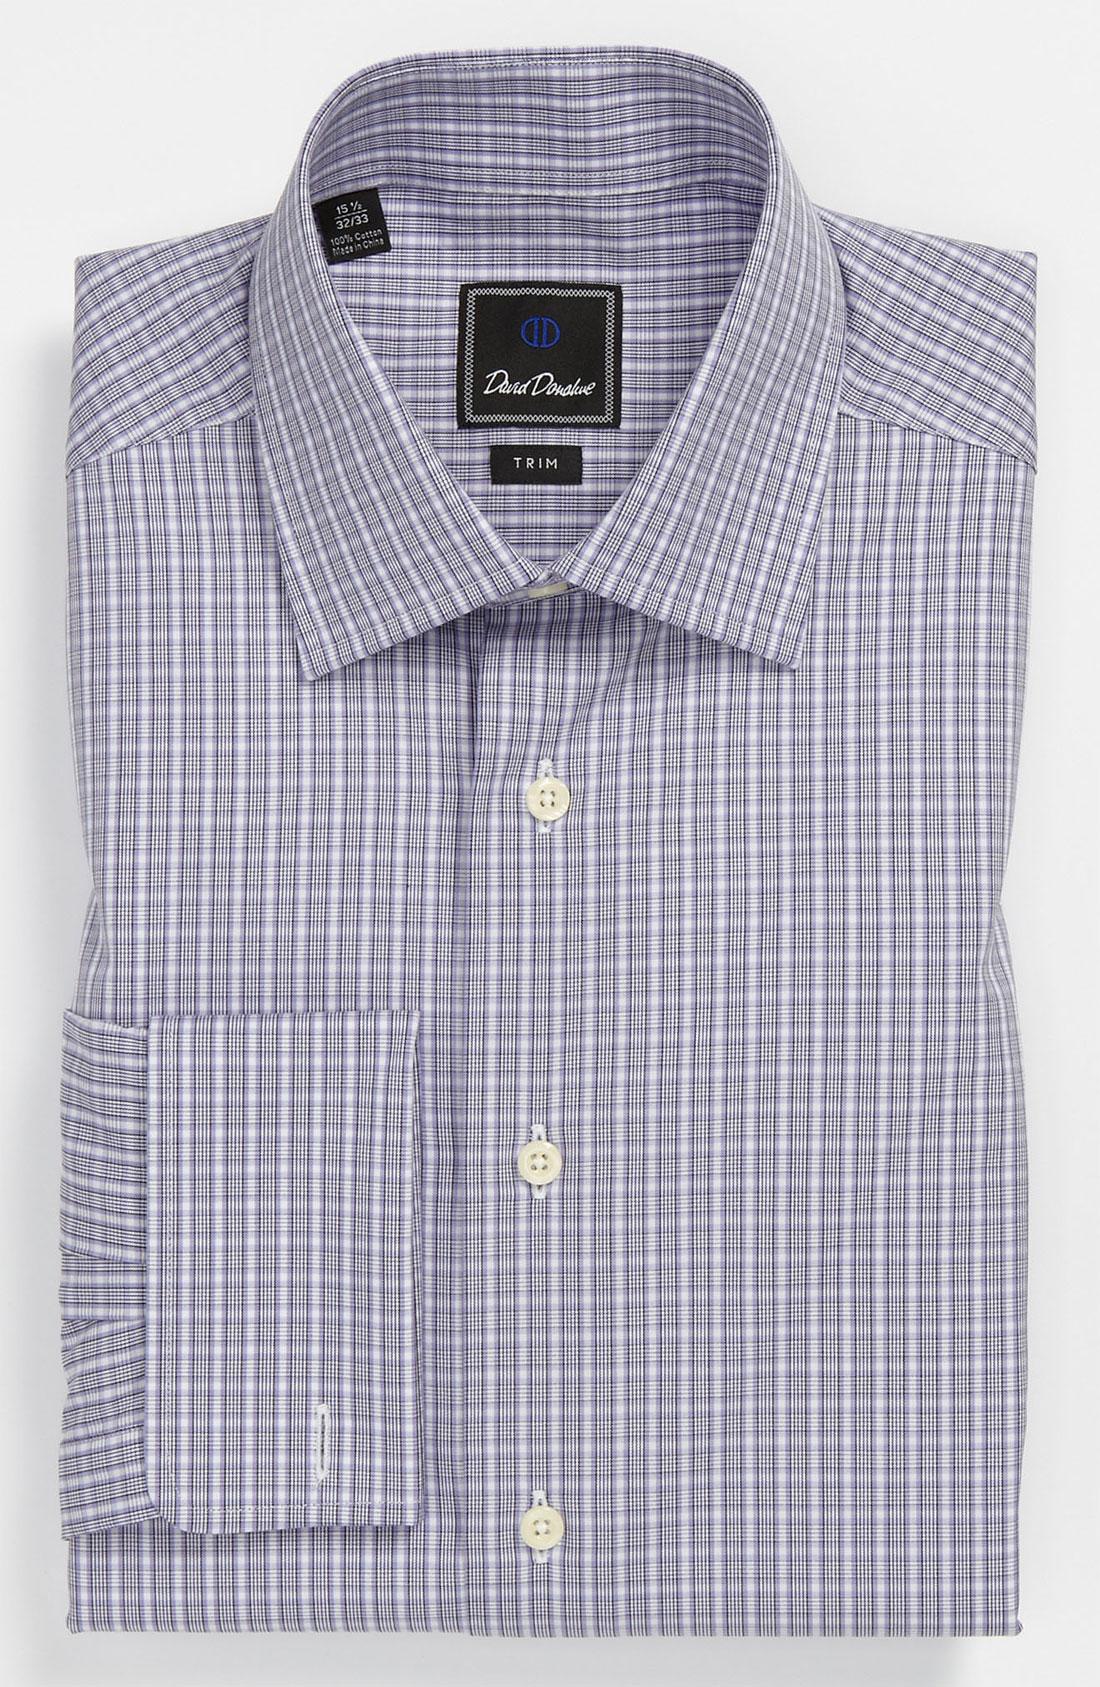 David Donahue Trim Fit Dress Shirt In Purple For Men Lyst